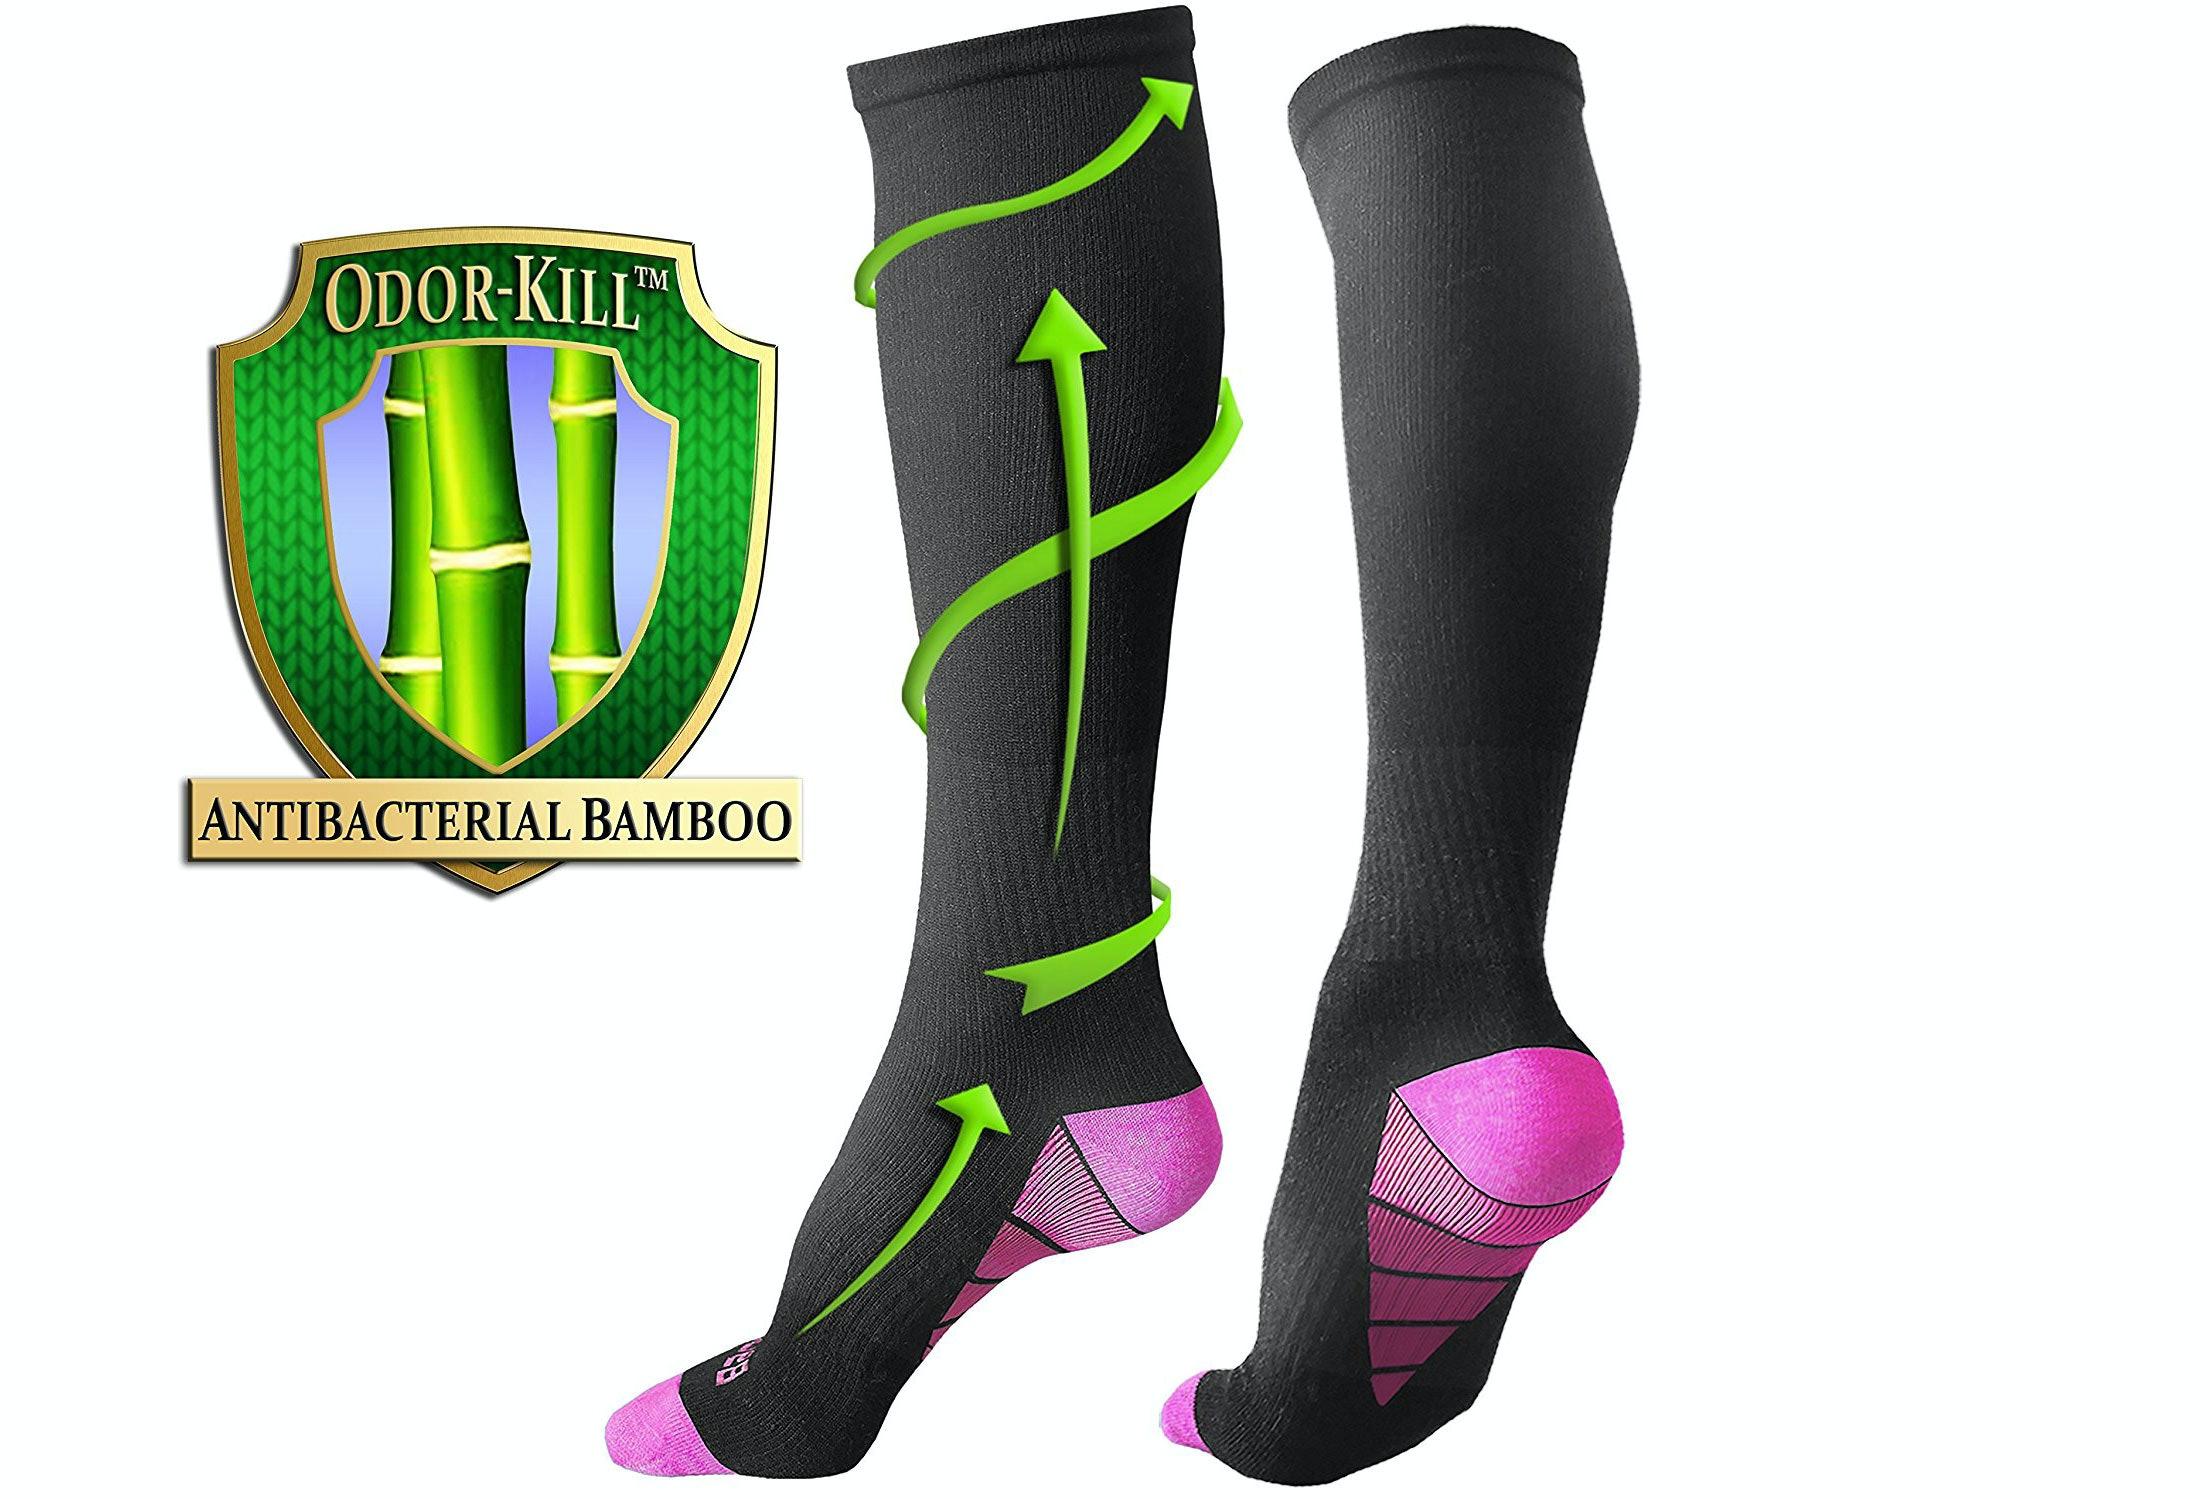 ab0a87fc95e19 The 6 Best Bamboo Socks